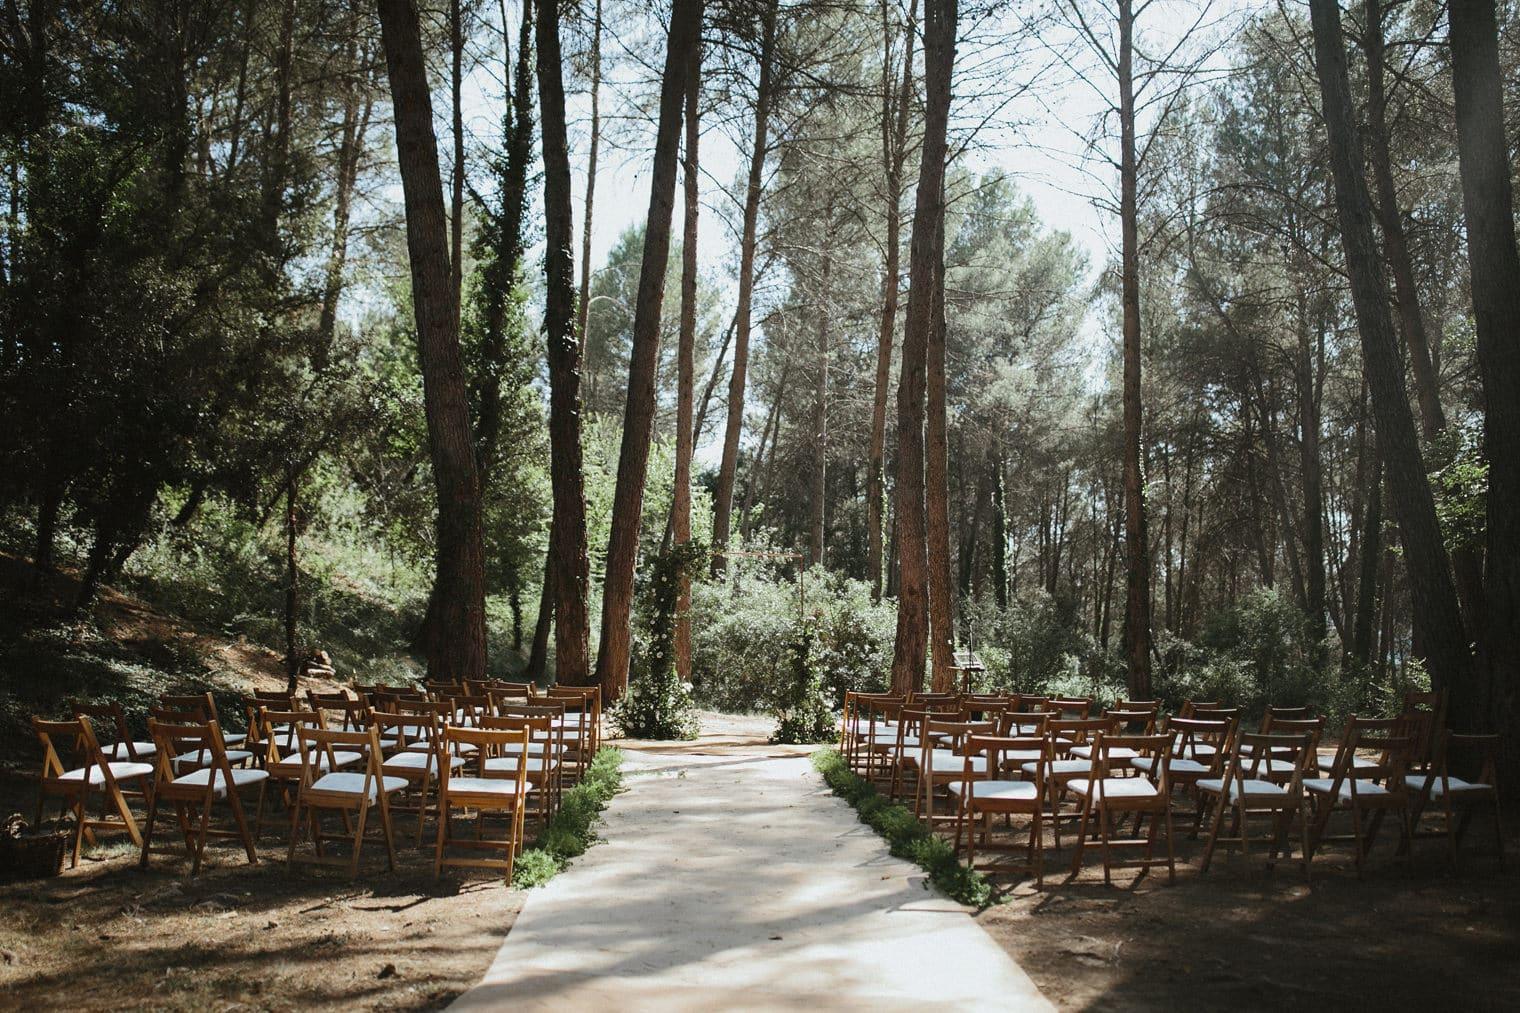 la garriga de castelladral outdoor ceremony location in the forest